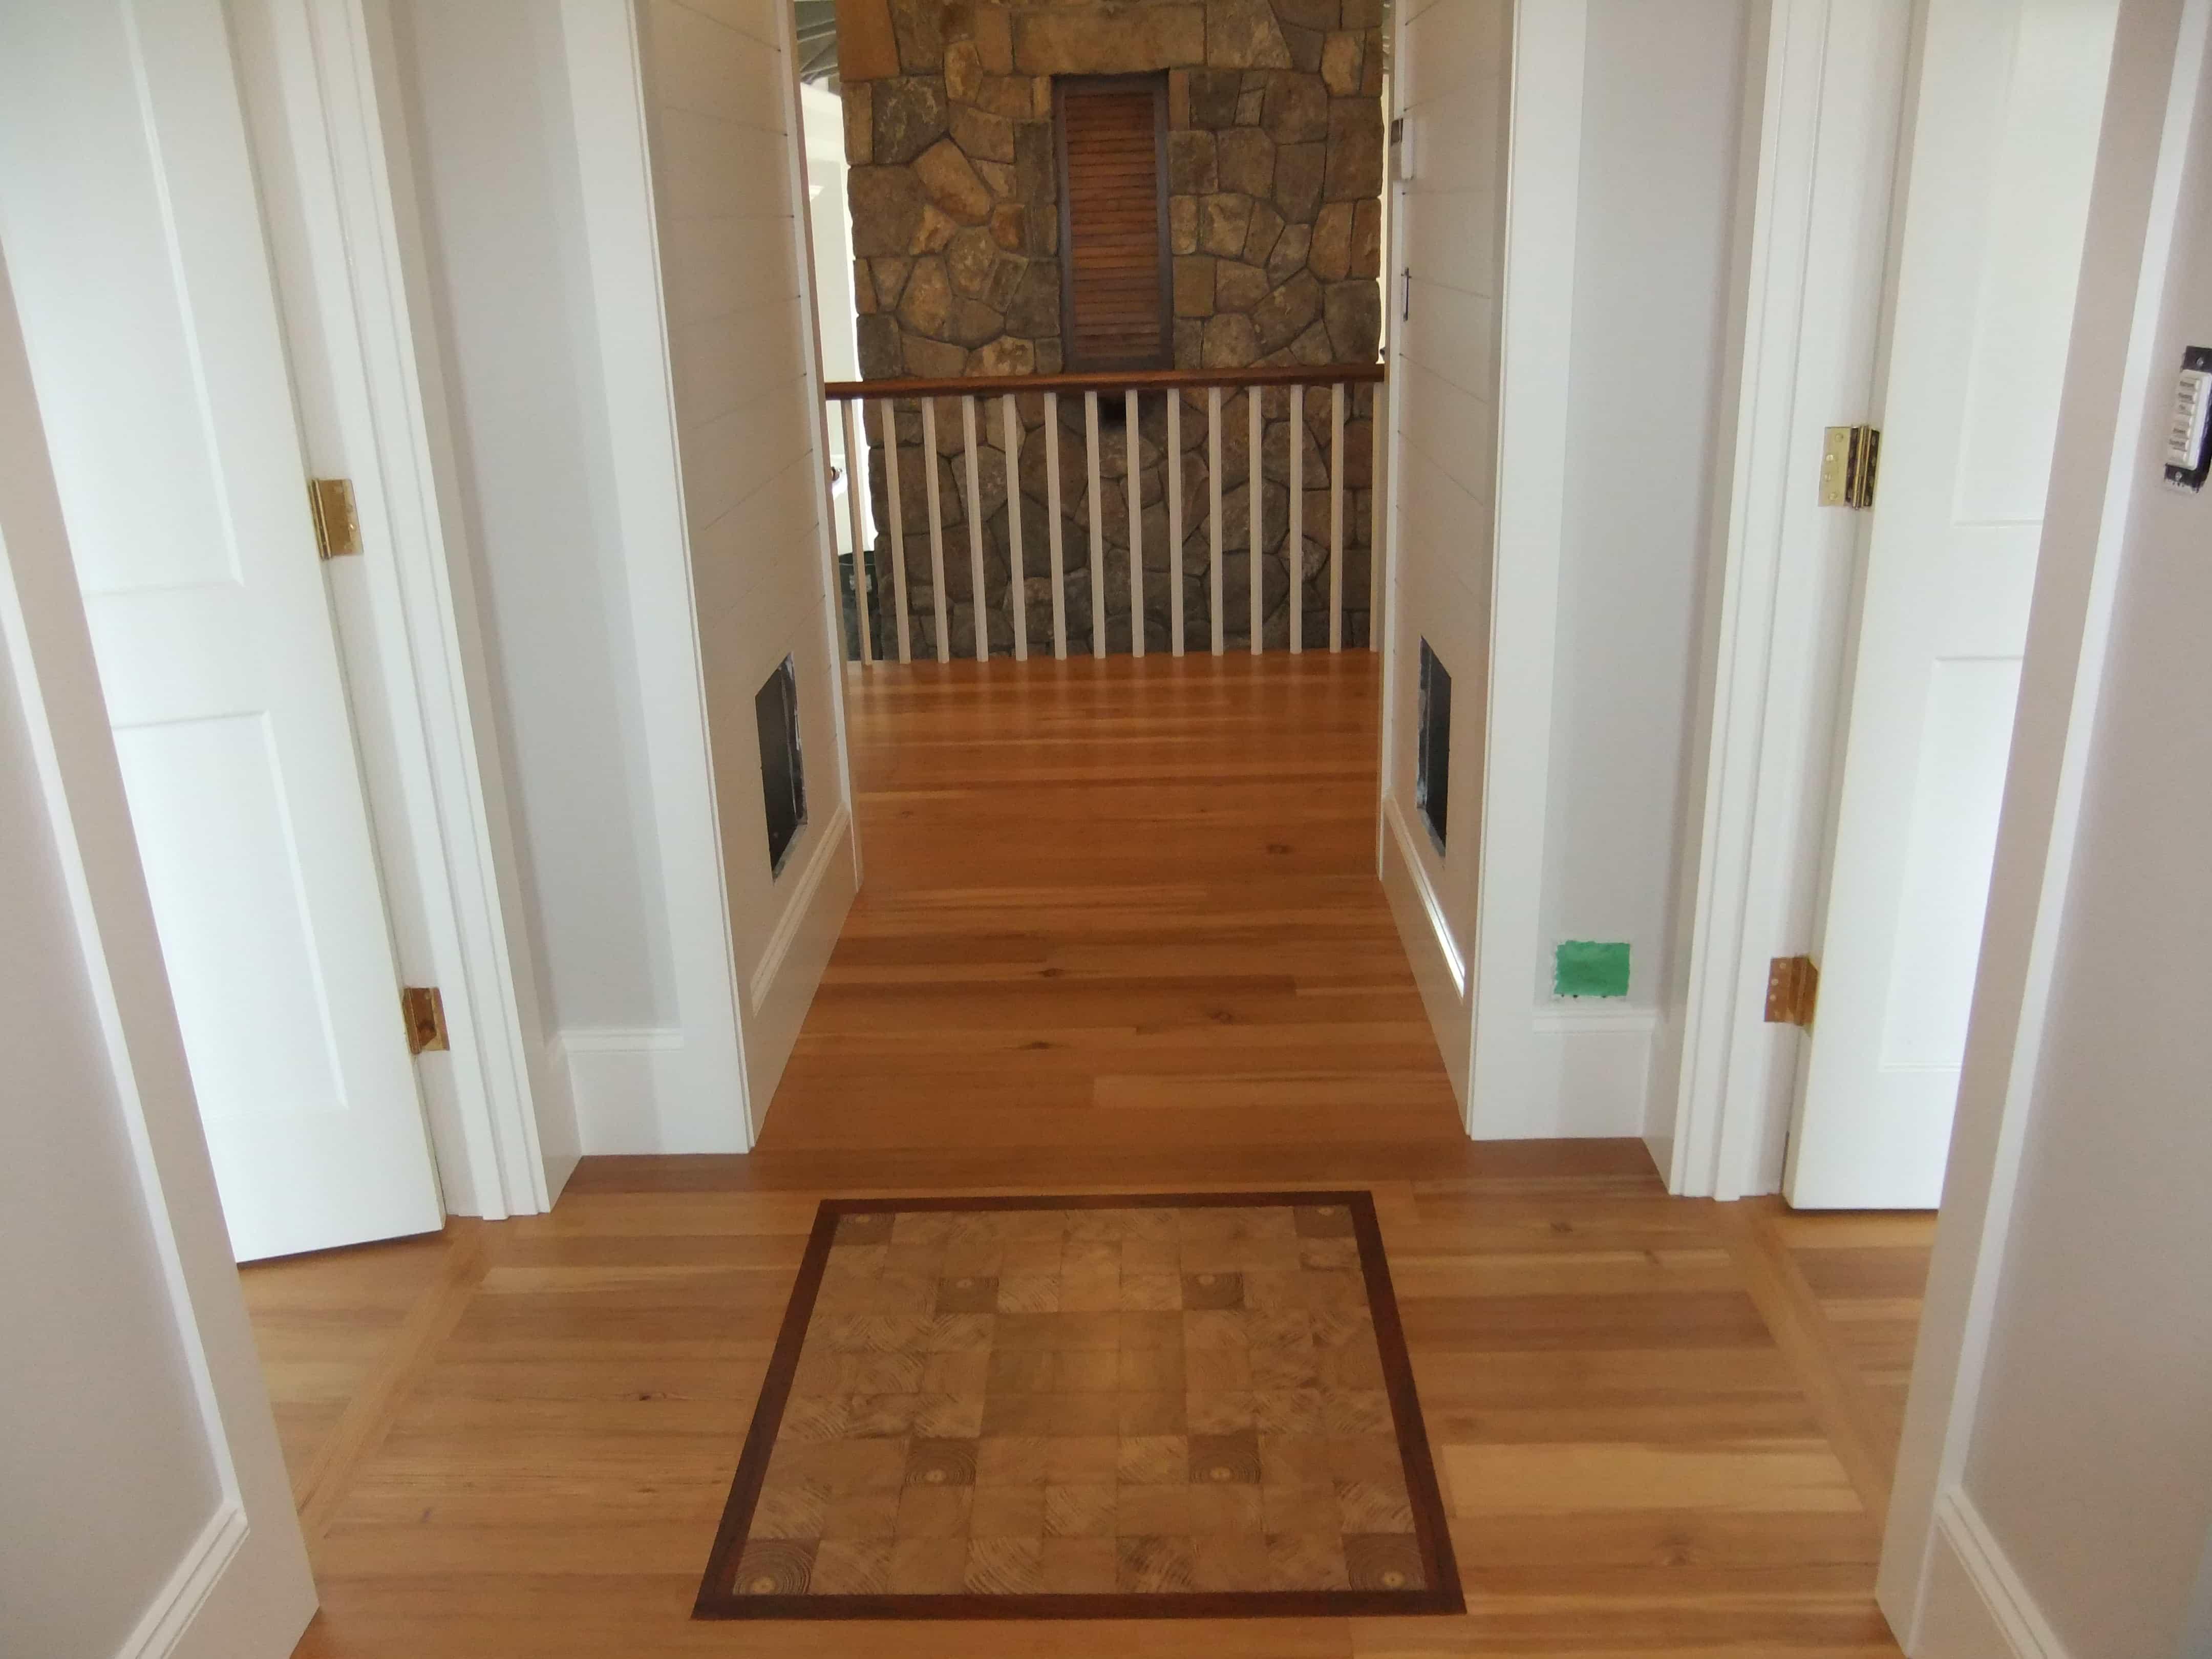 Custom borders and inlays - Krikorian Hardwood Floors